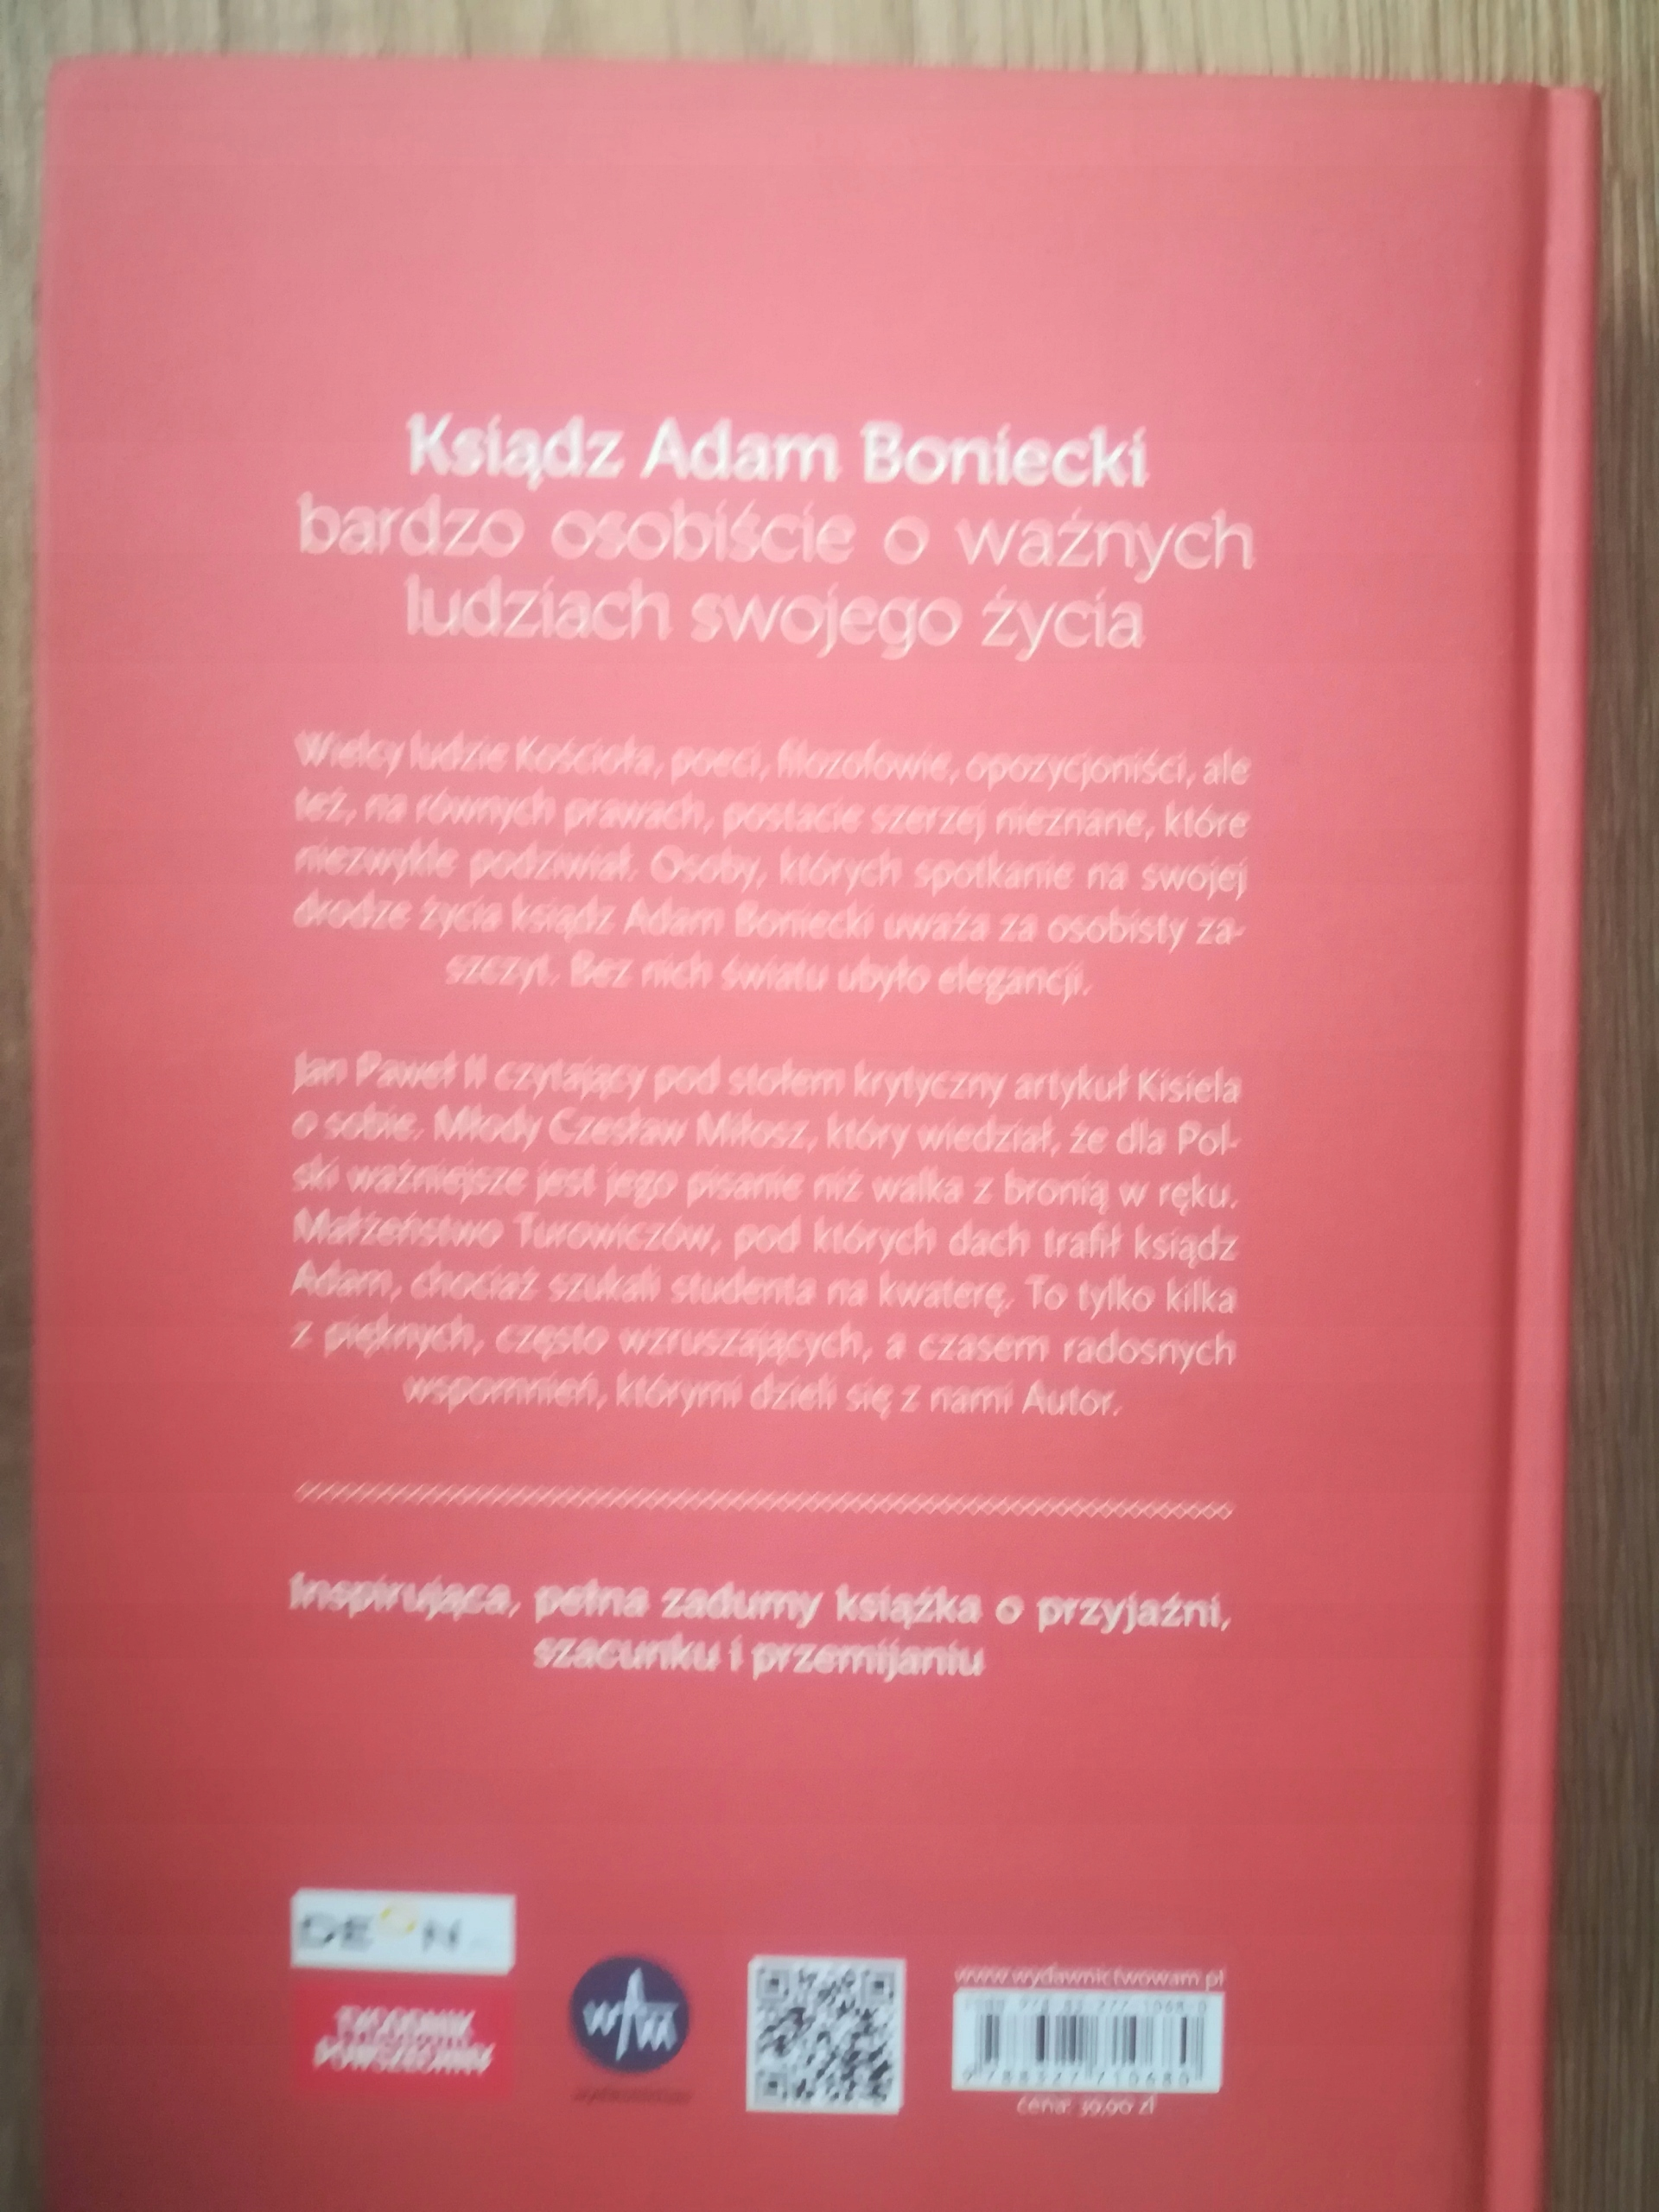 fa52ddc2adc3dc Abonent chwilowo niedostępny ks. Adam Boniecki - 7513845516 ...